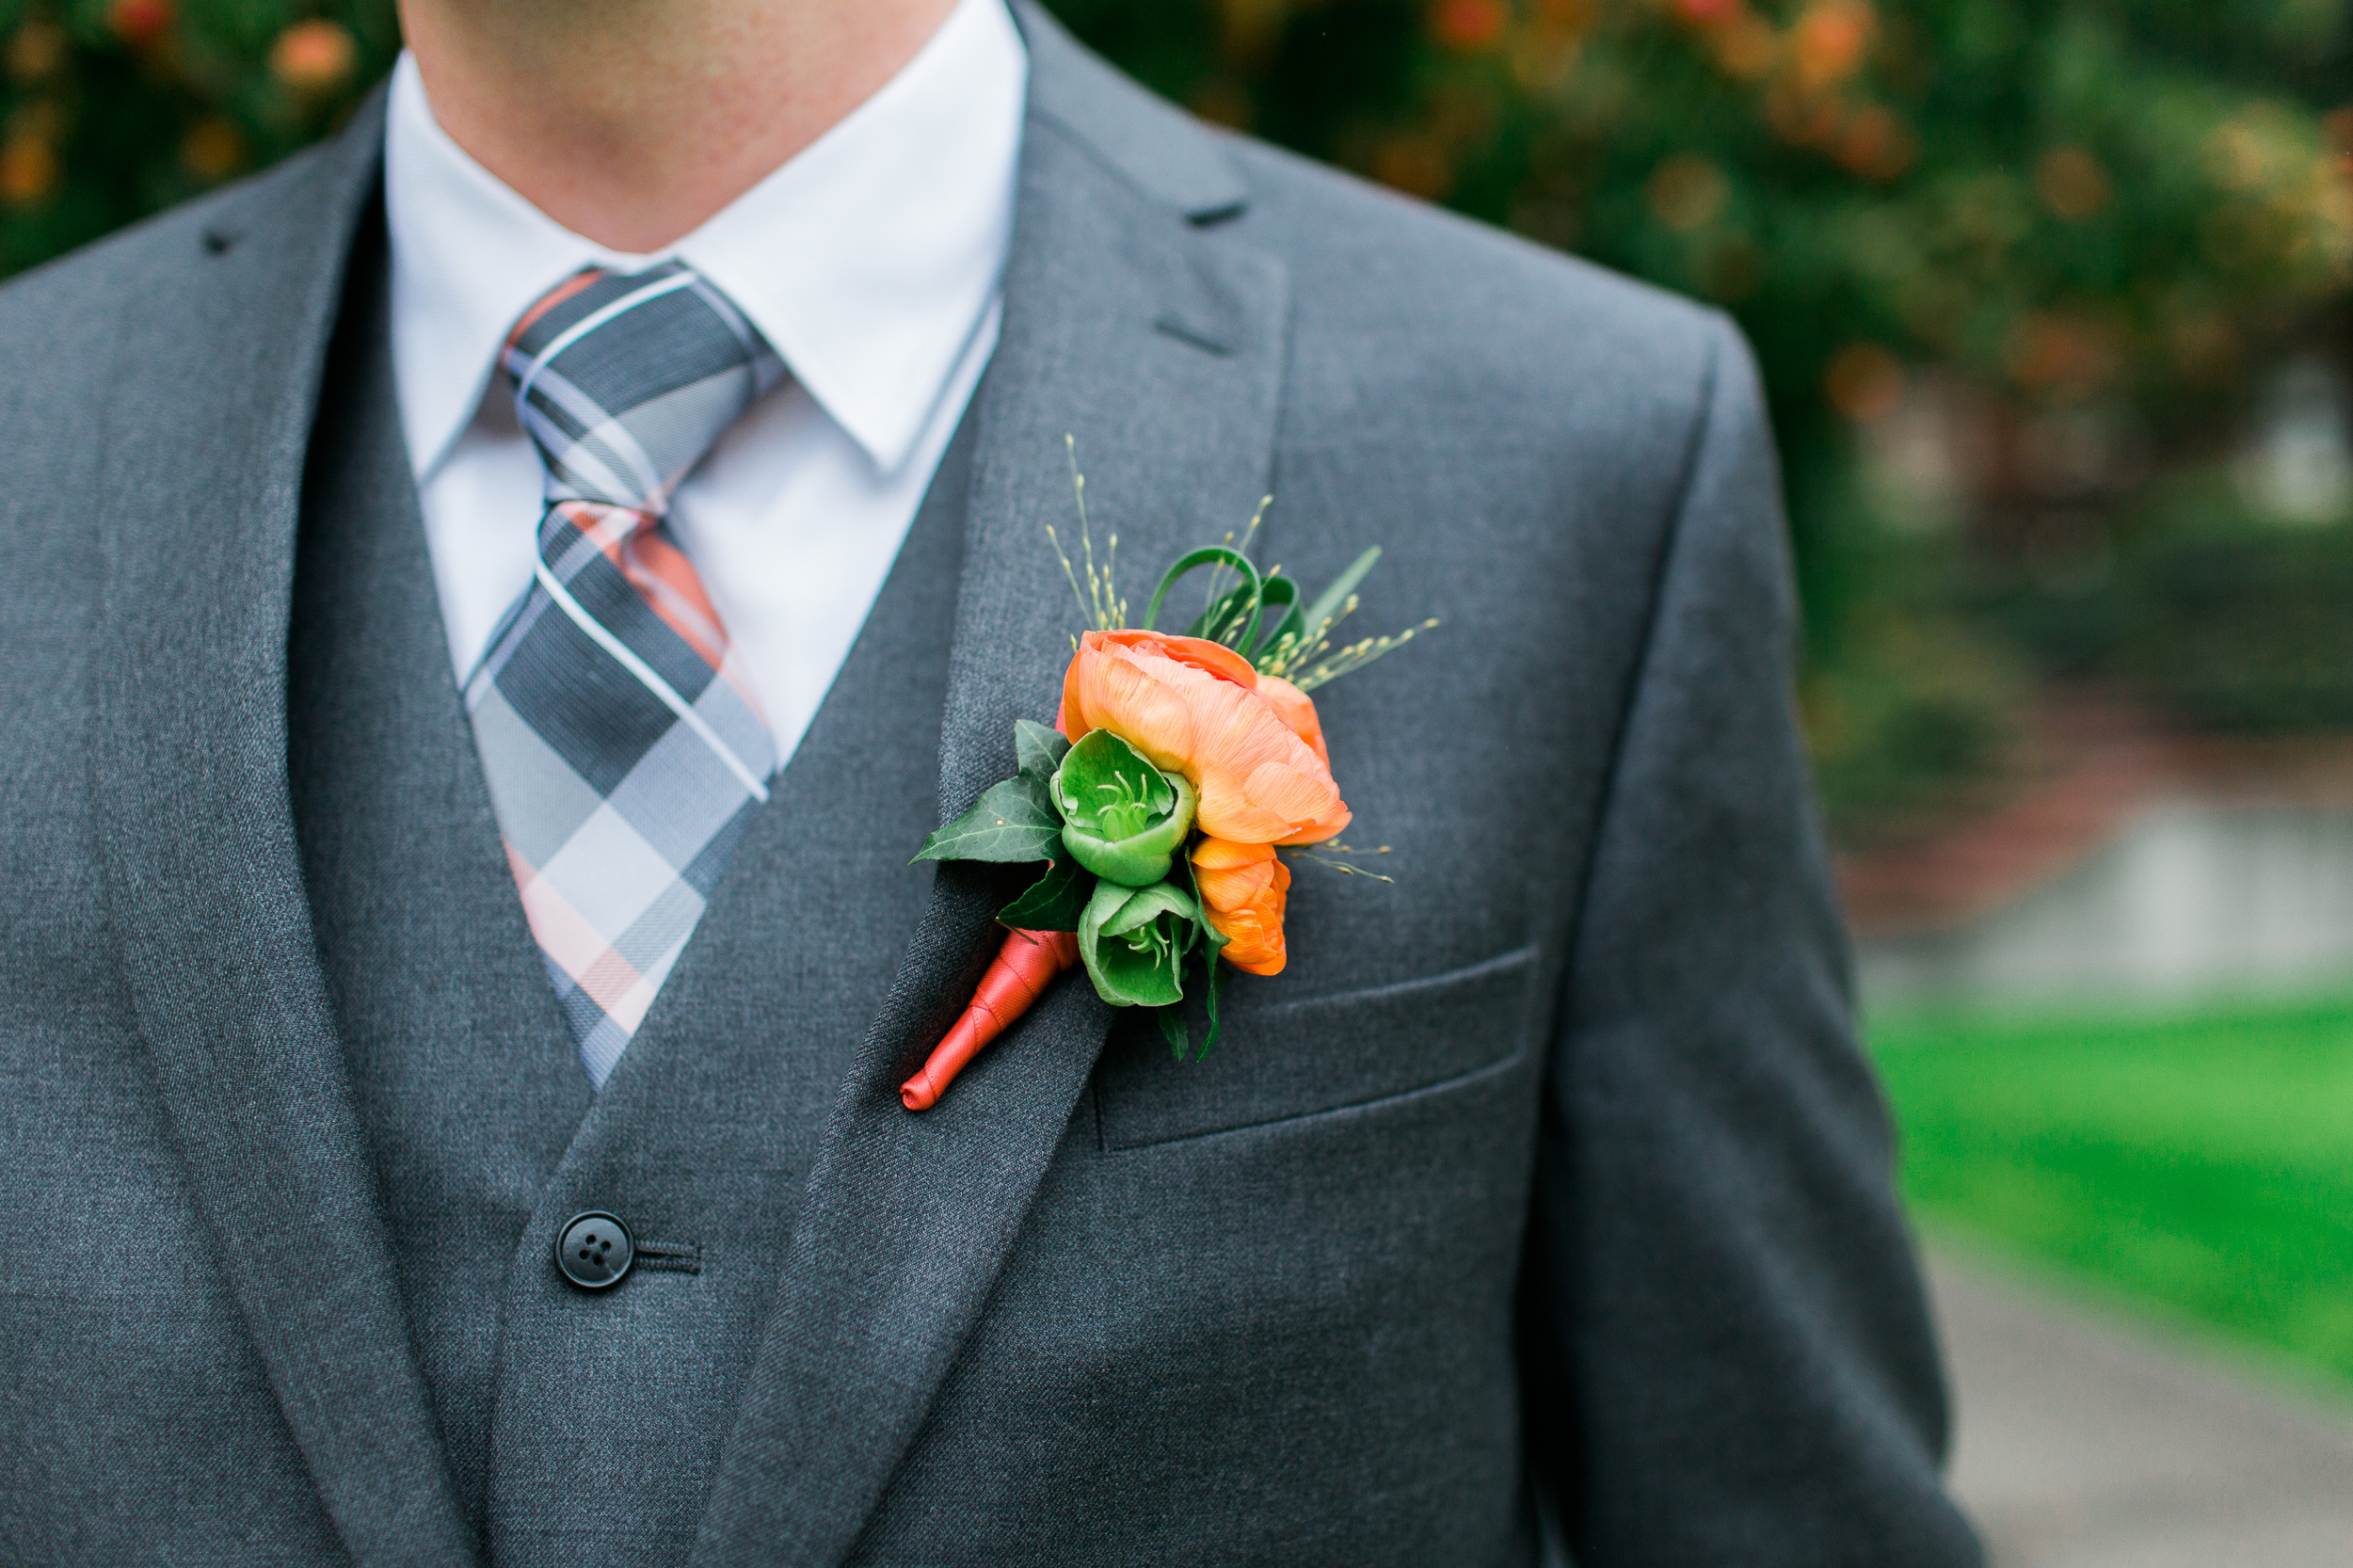 Groom Boutonniere   Peach and Green Boutonniere   Ranunculus Boutonniere   Parsons Garden Wedding   Asgari Photography   Seattle Wedding Planner